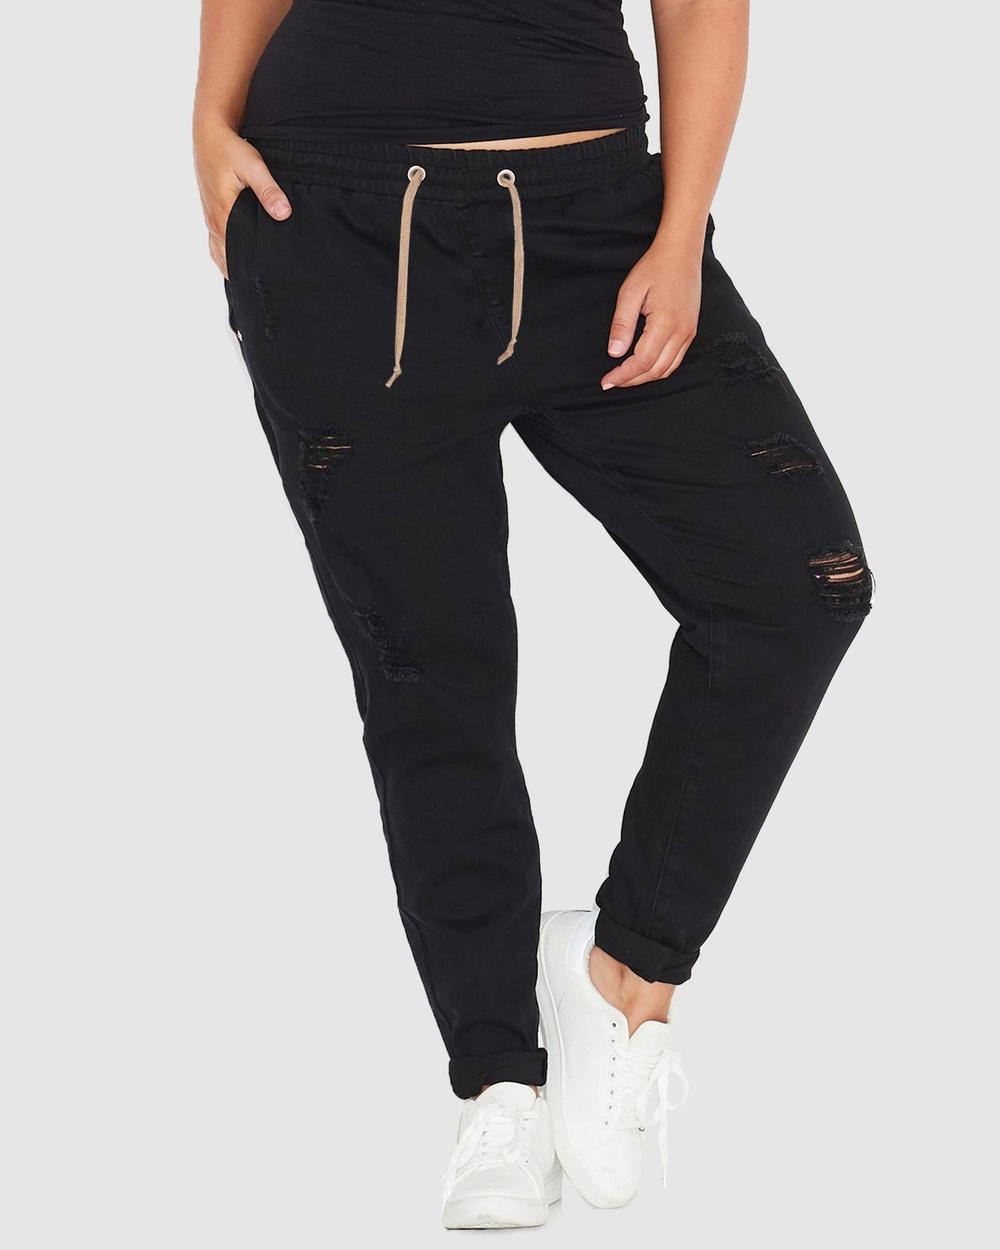 17 Sundays Warpaint Joggers Jeans Black Australia